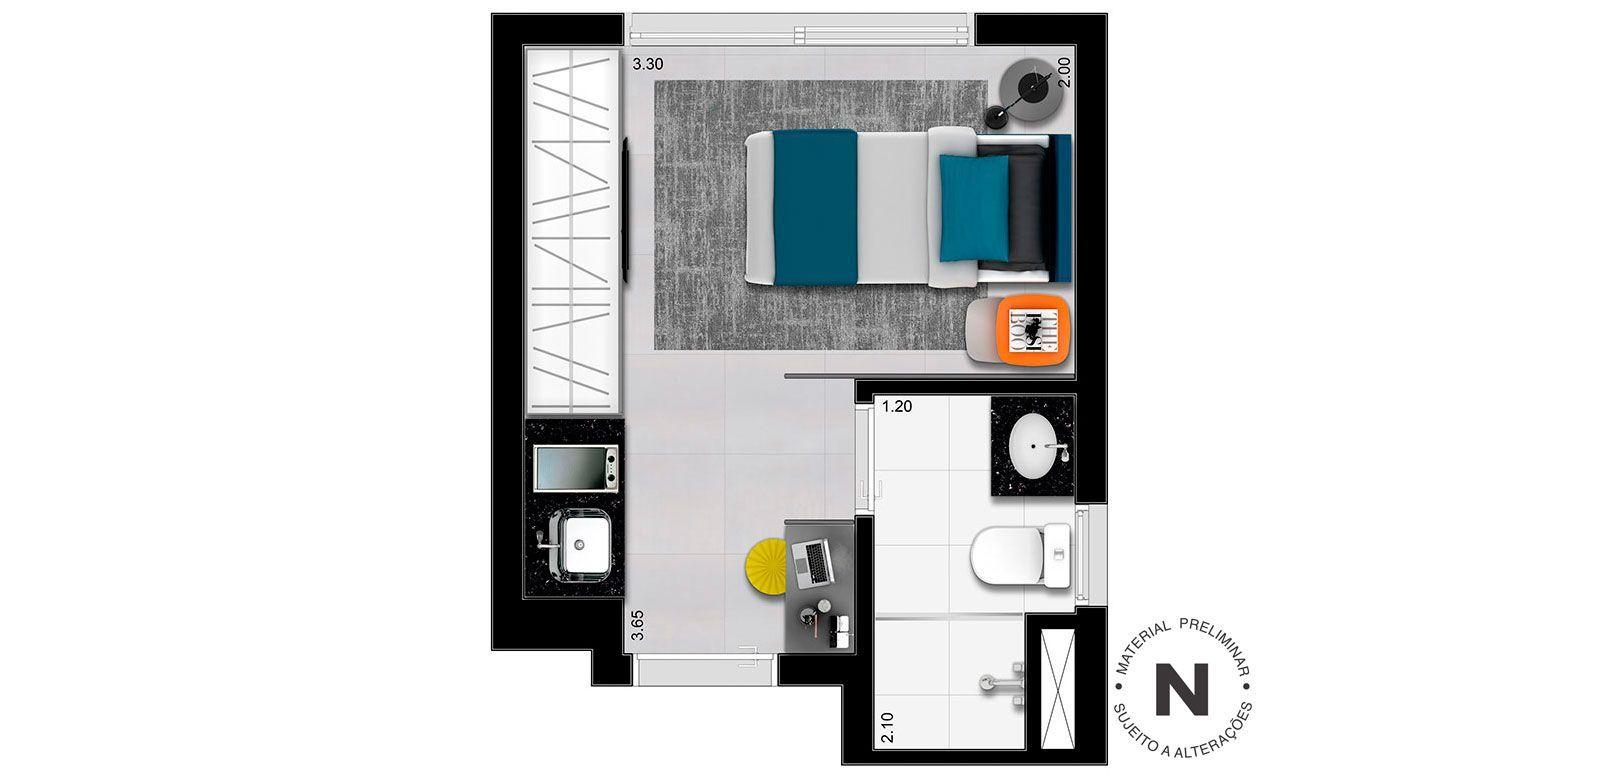 studio 14m mini casa pinterest. Black Bedroom Furniture Sets. Home Design Ideas